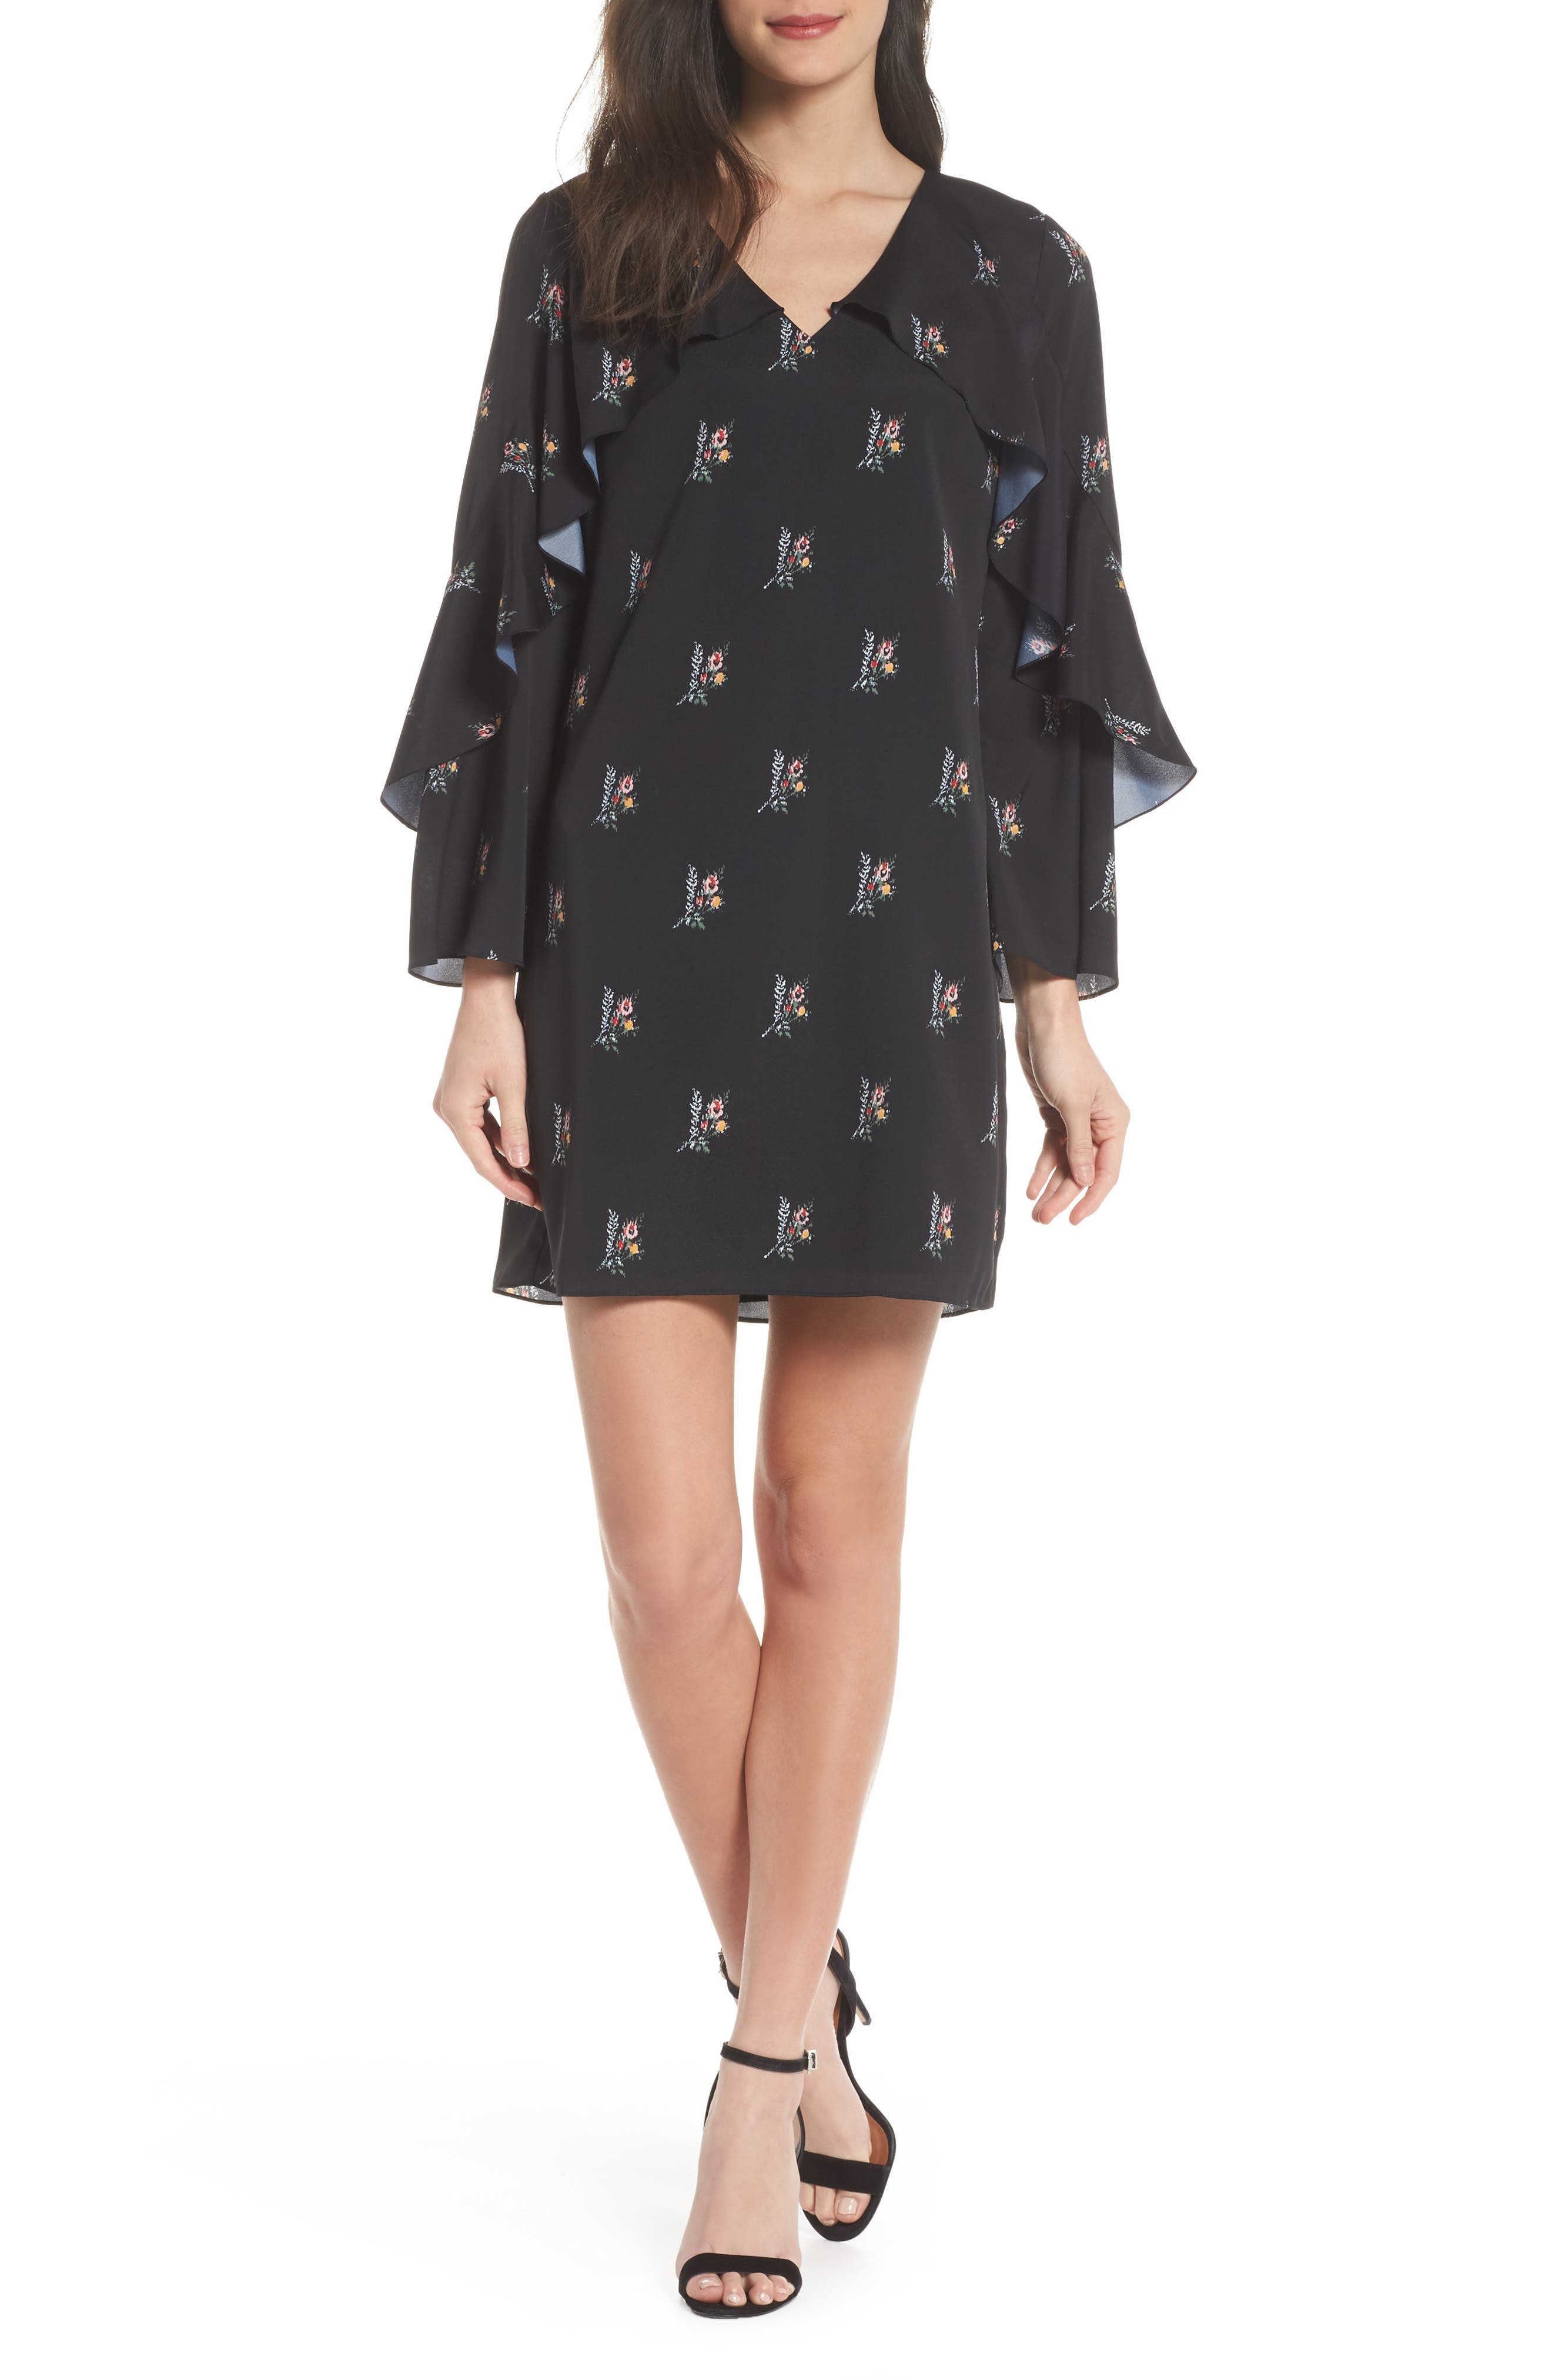 Olessia Ruffle Shift Dress,                             Main thumbnail 1, color,                             Black Multi